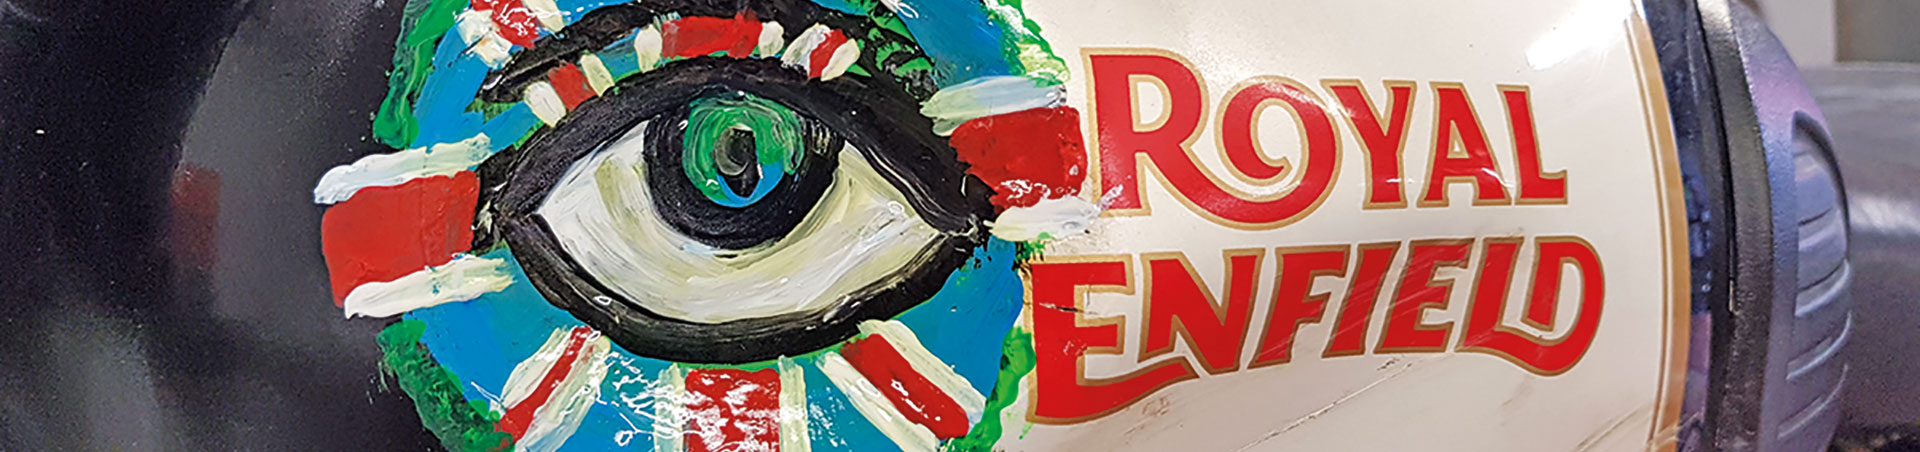 Titelbild-Royal-Enfield-kreative-Beulenreparatur_31-07-2020_78e3b